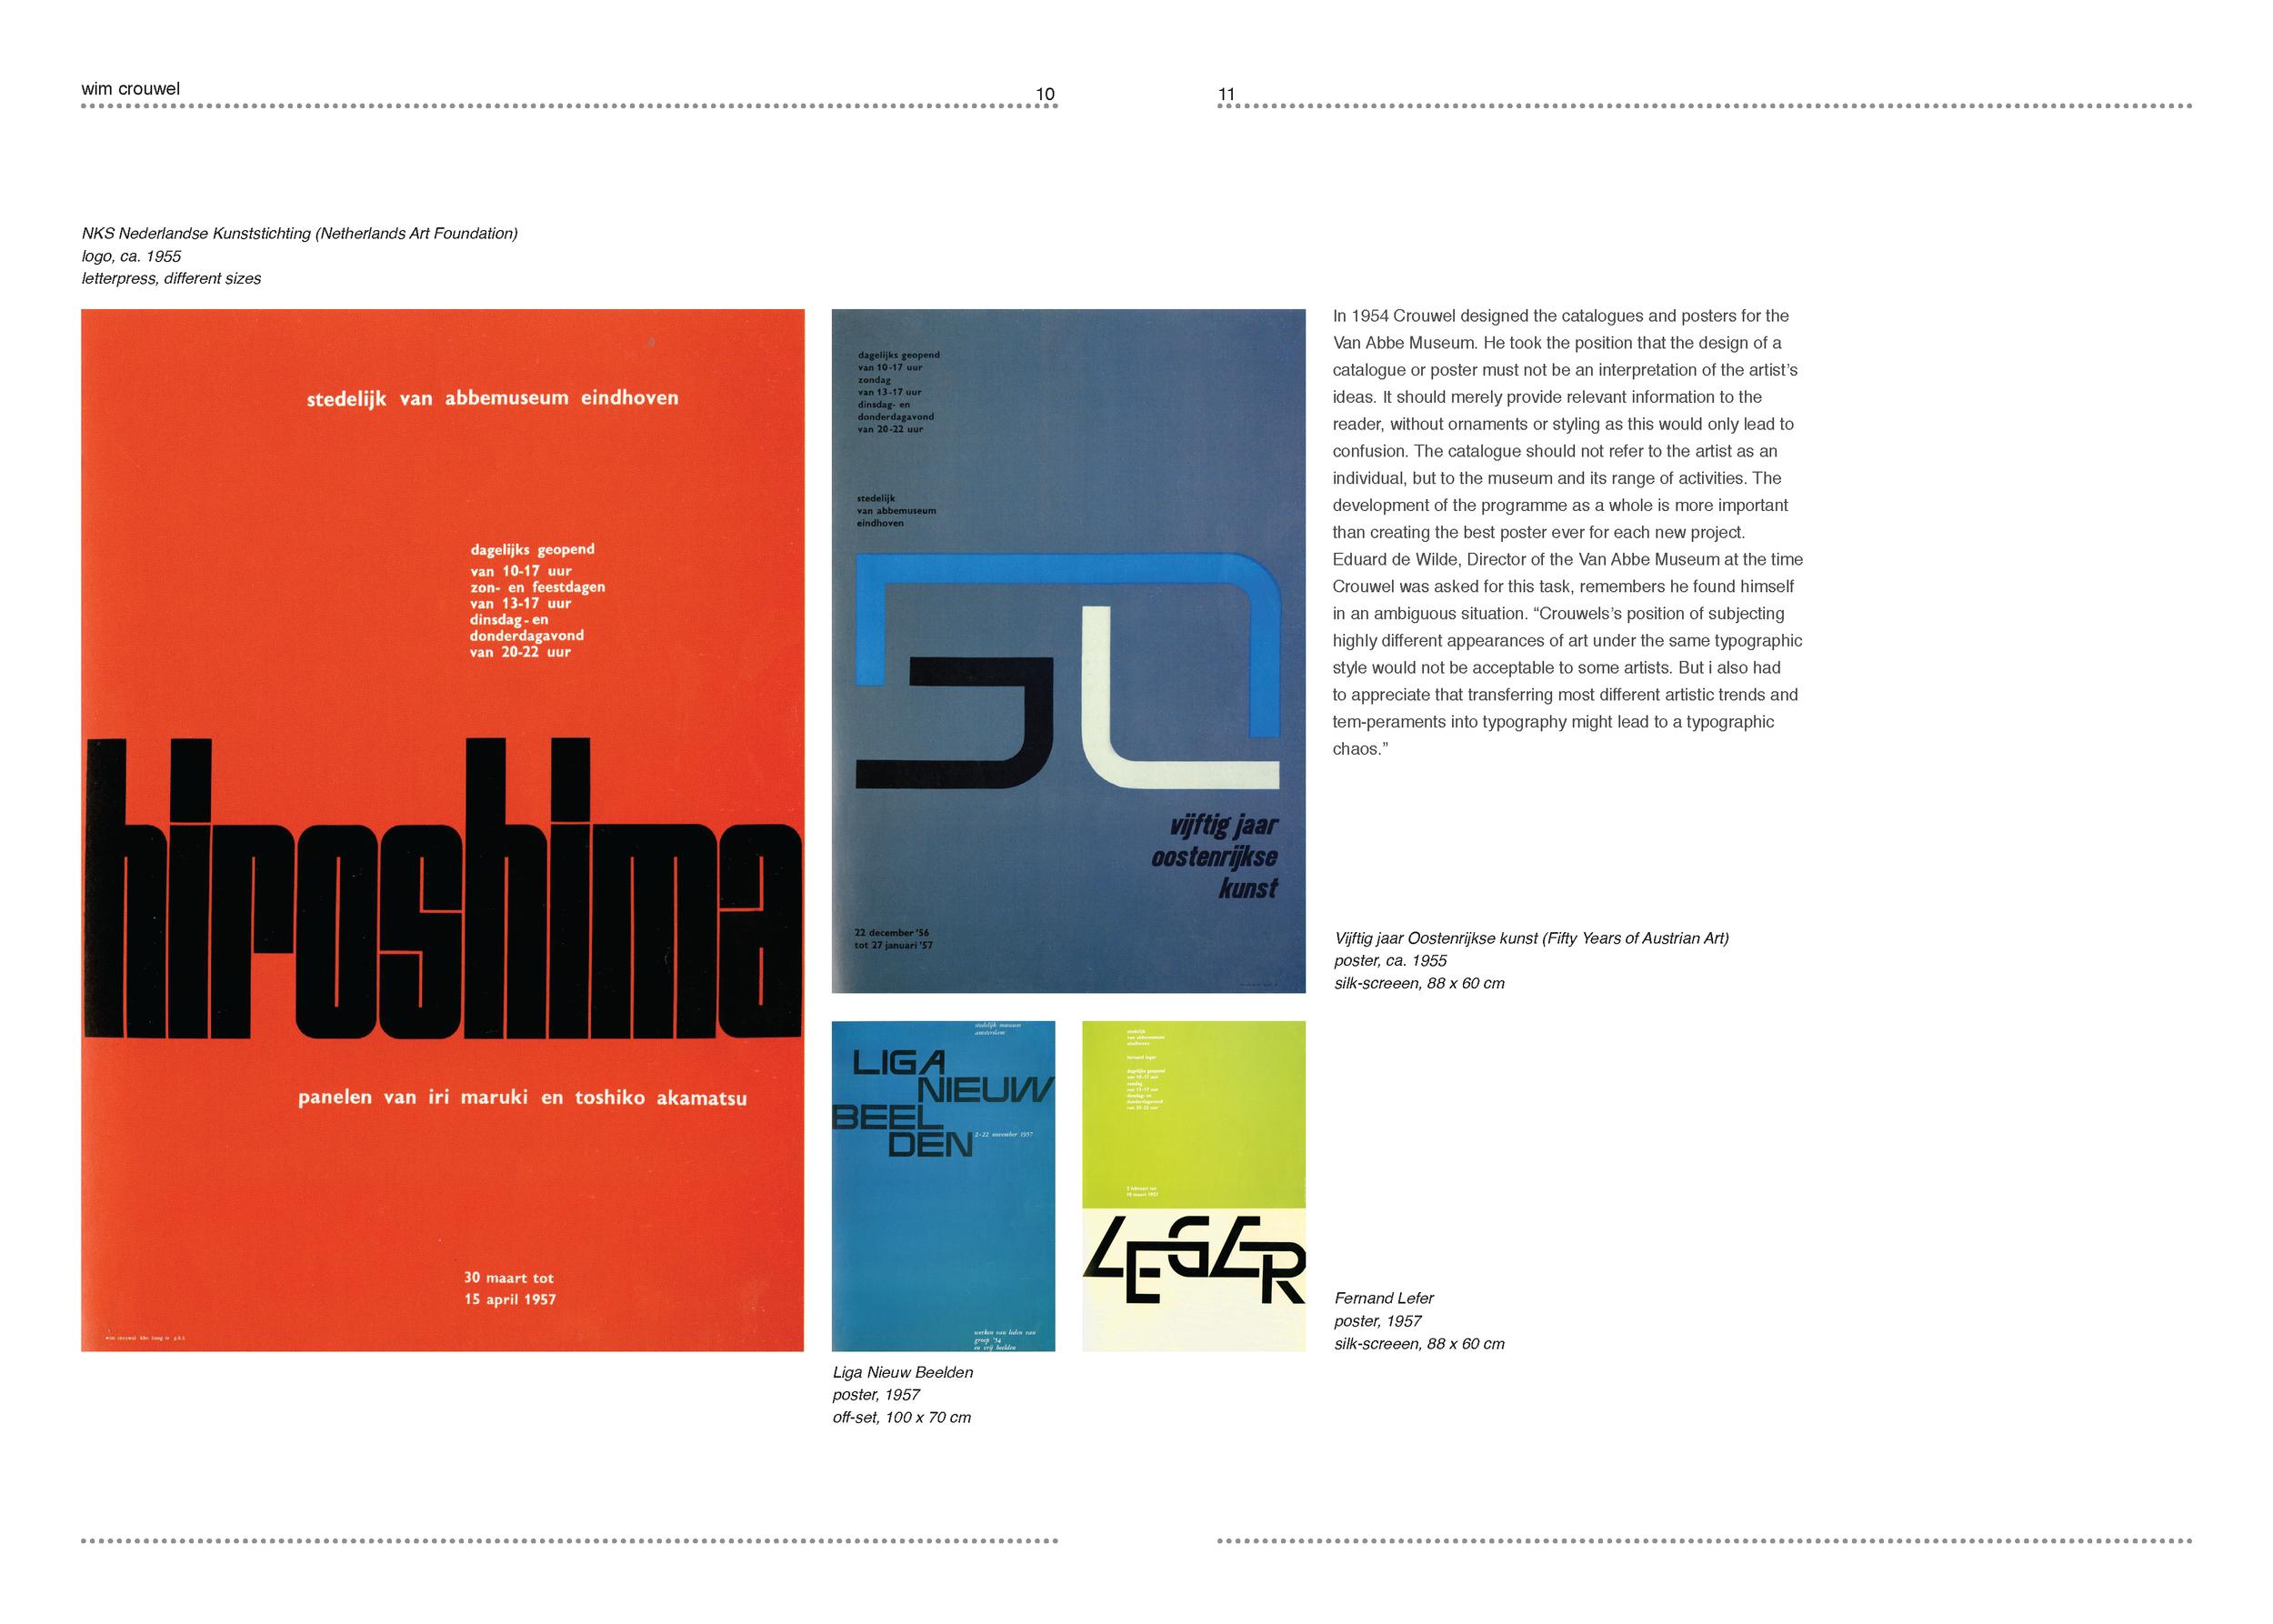 wim_crouwel_booklet copy_Page_06.png